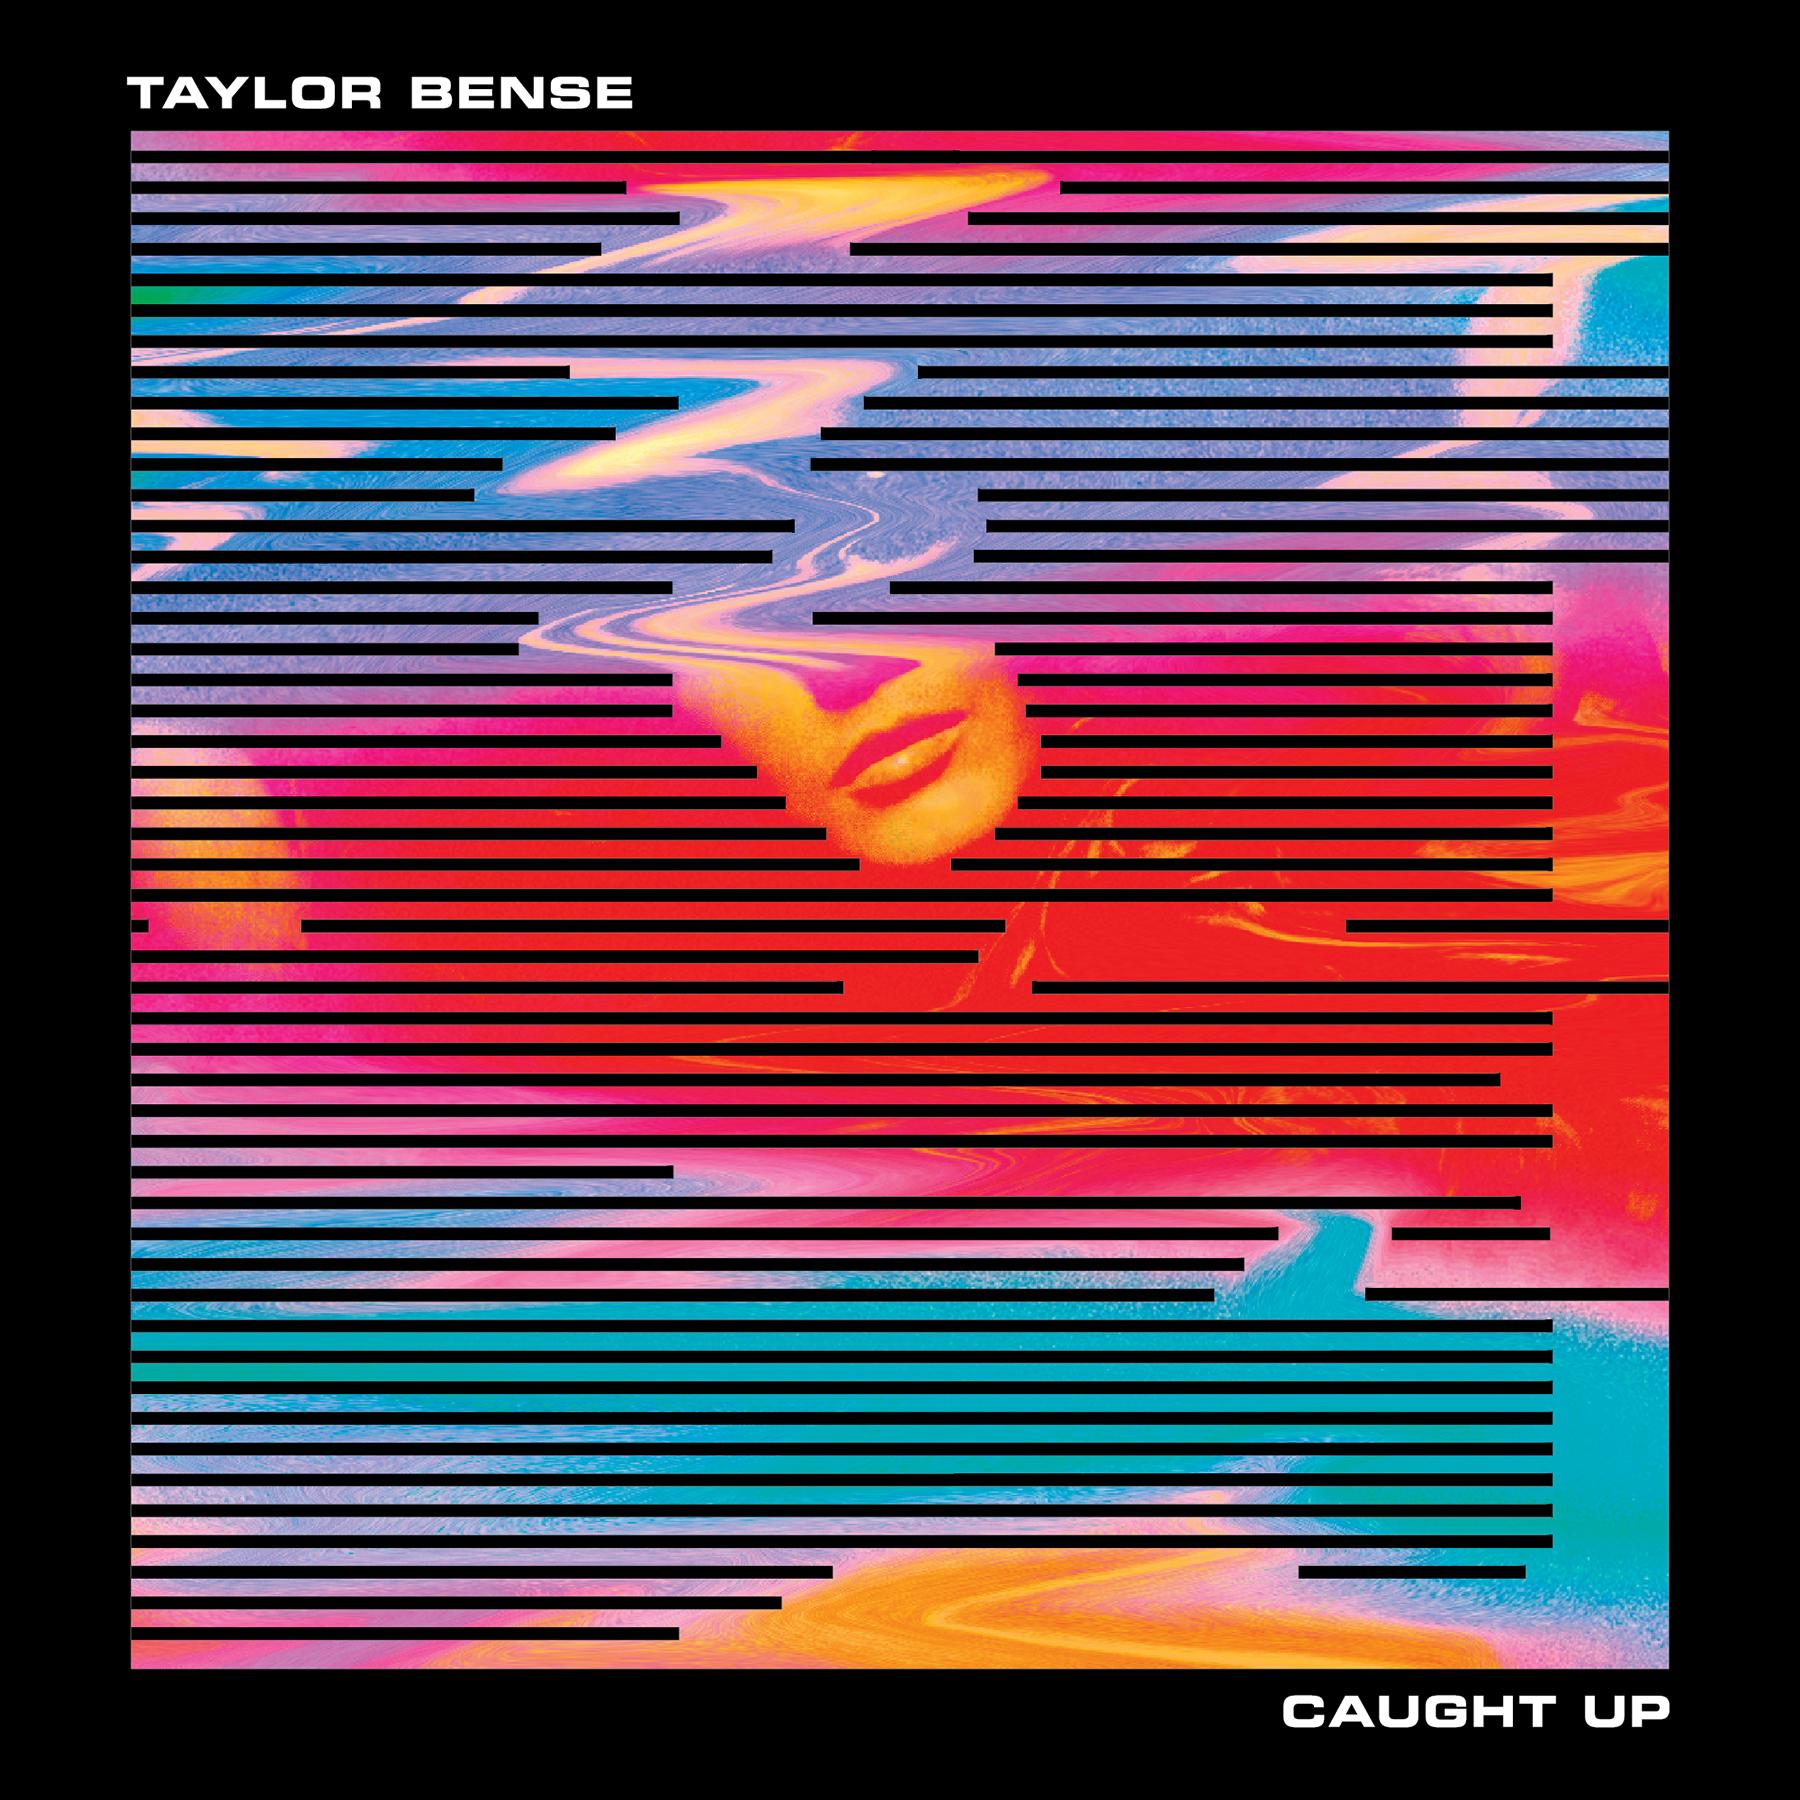 TaylorBense_CaughtUp_Final-Digital-1800x1800px.jpg